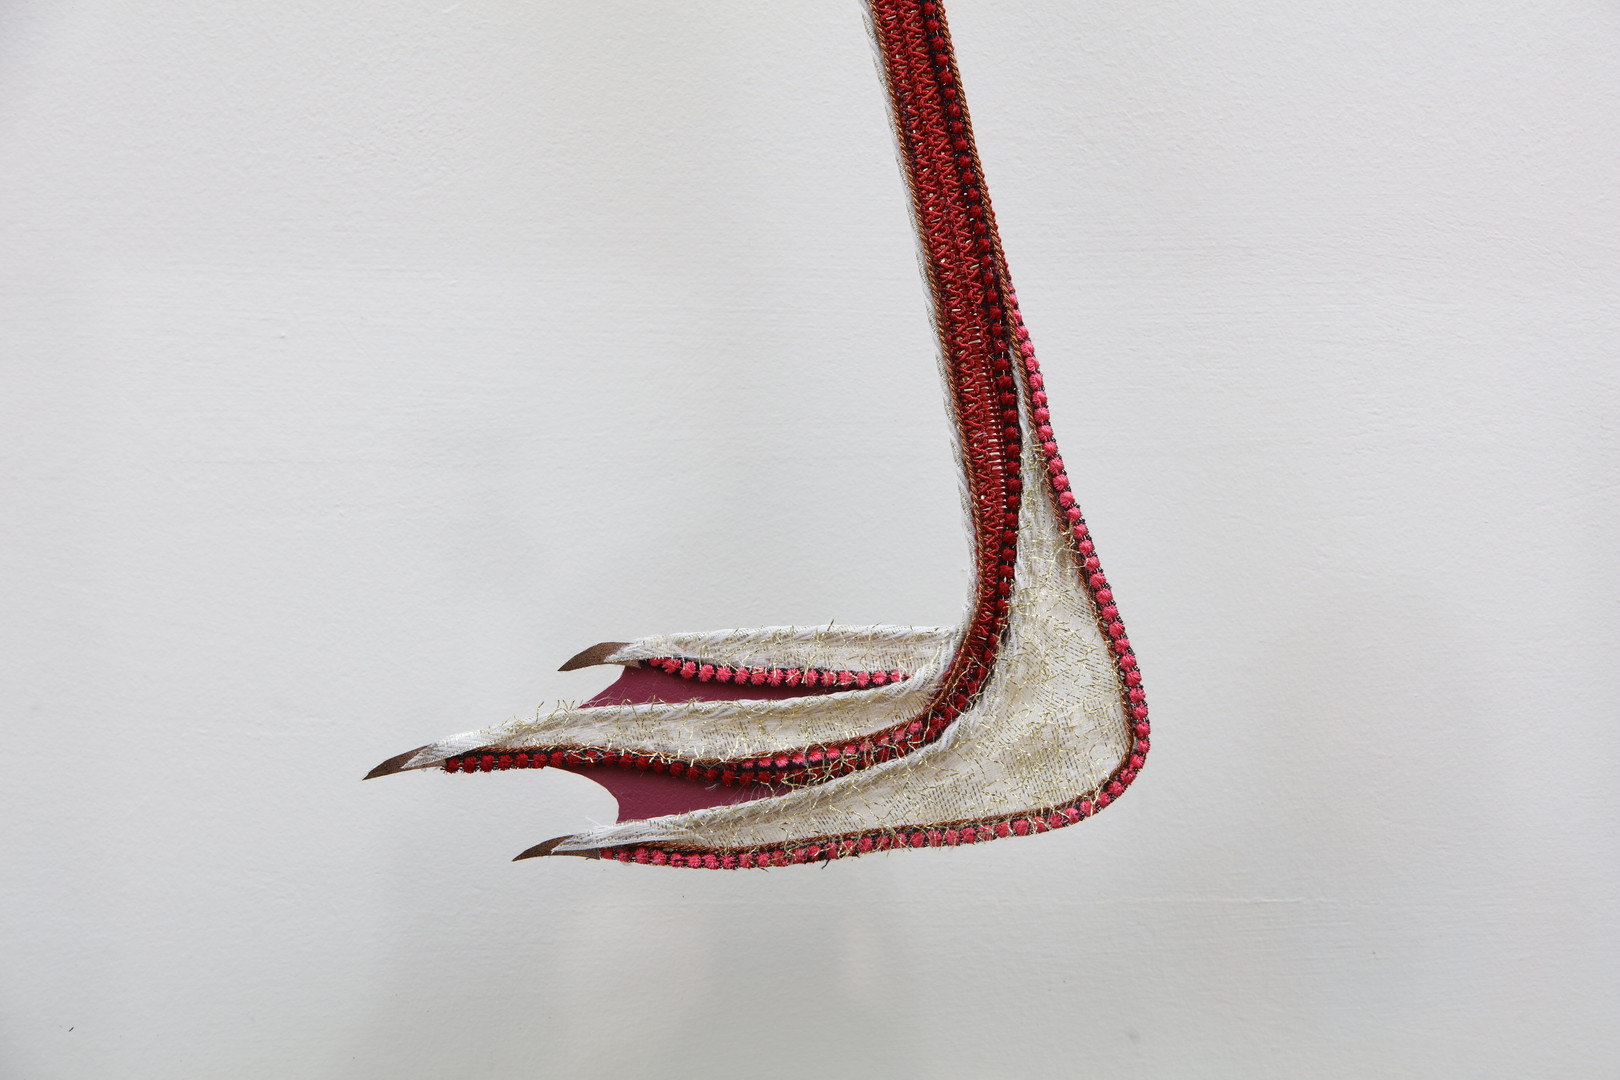 Flamingo foot